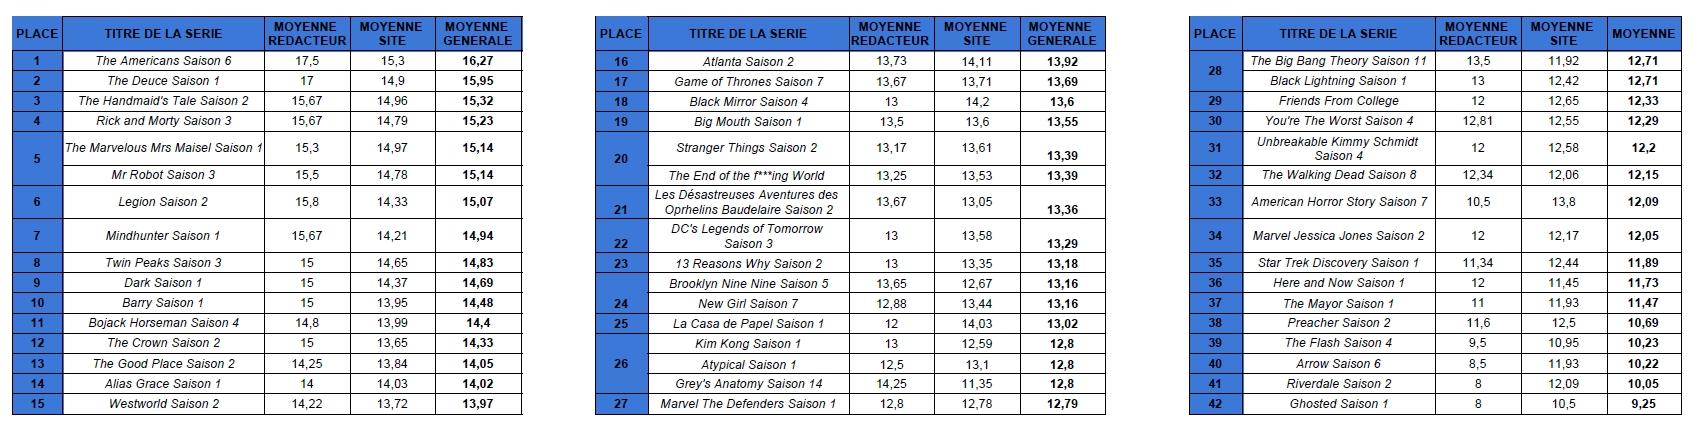 classement-general-2017-2018